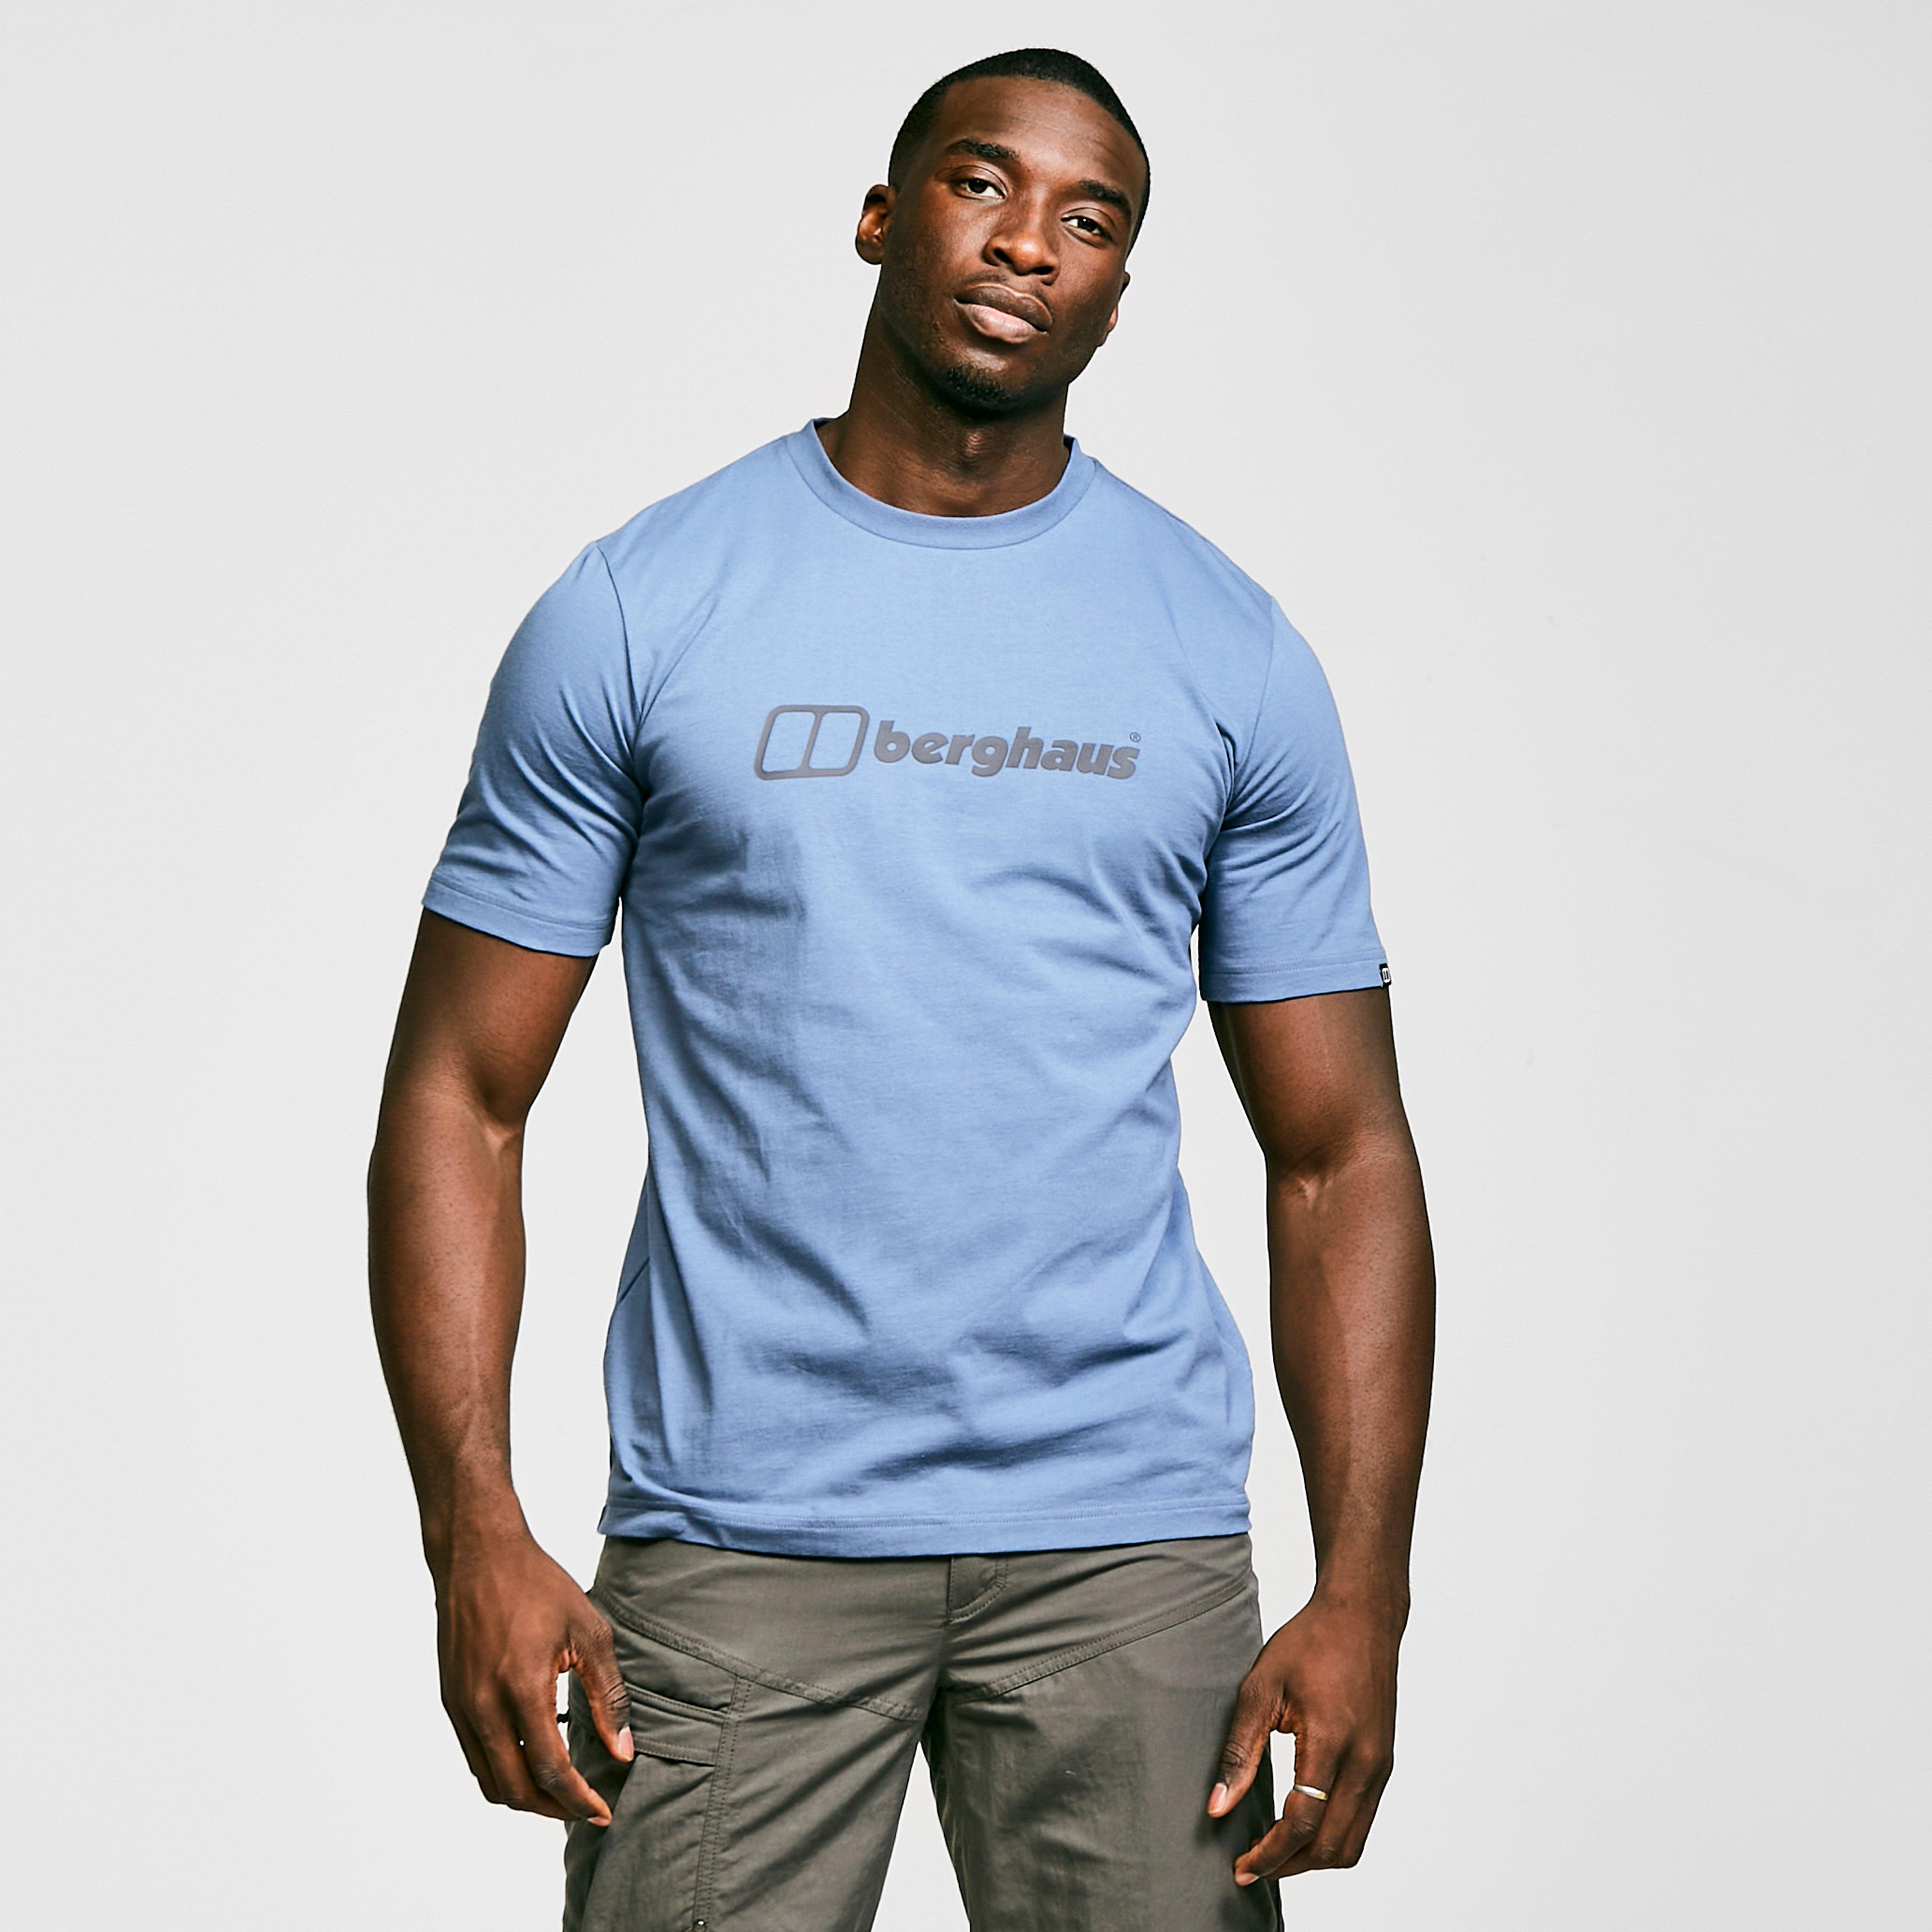 Berghaus Mens Colour Logo T-shirt - Blue/blue  Blue/blue